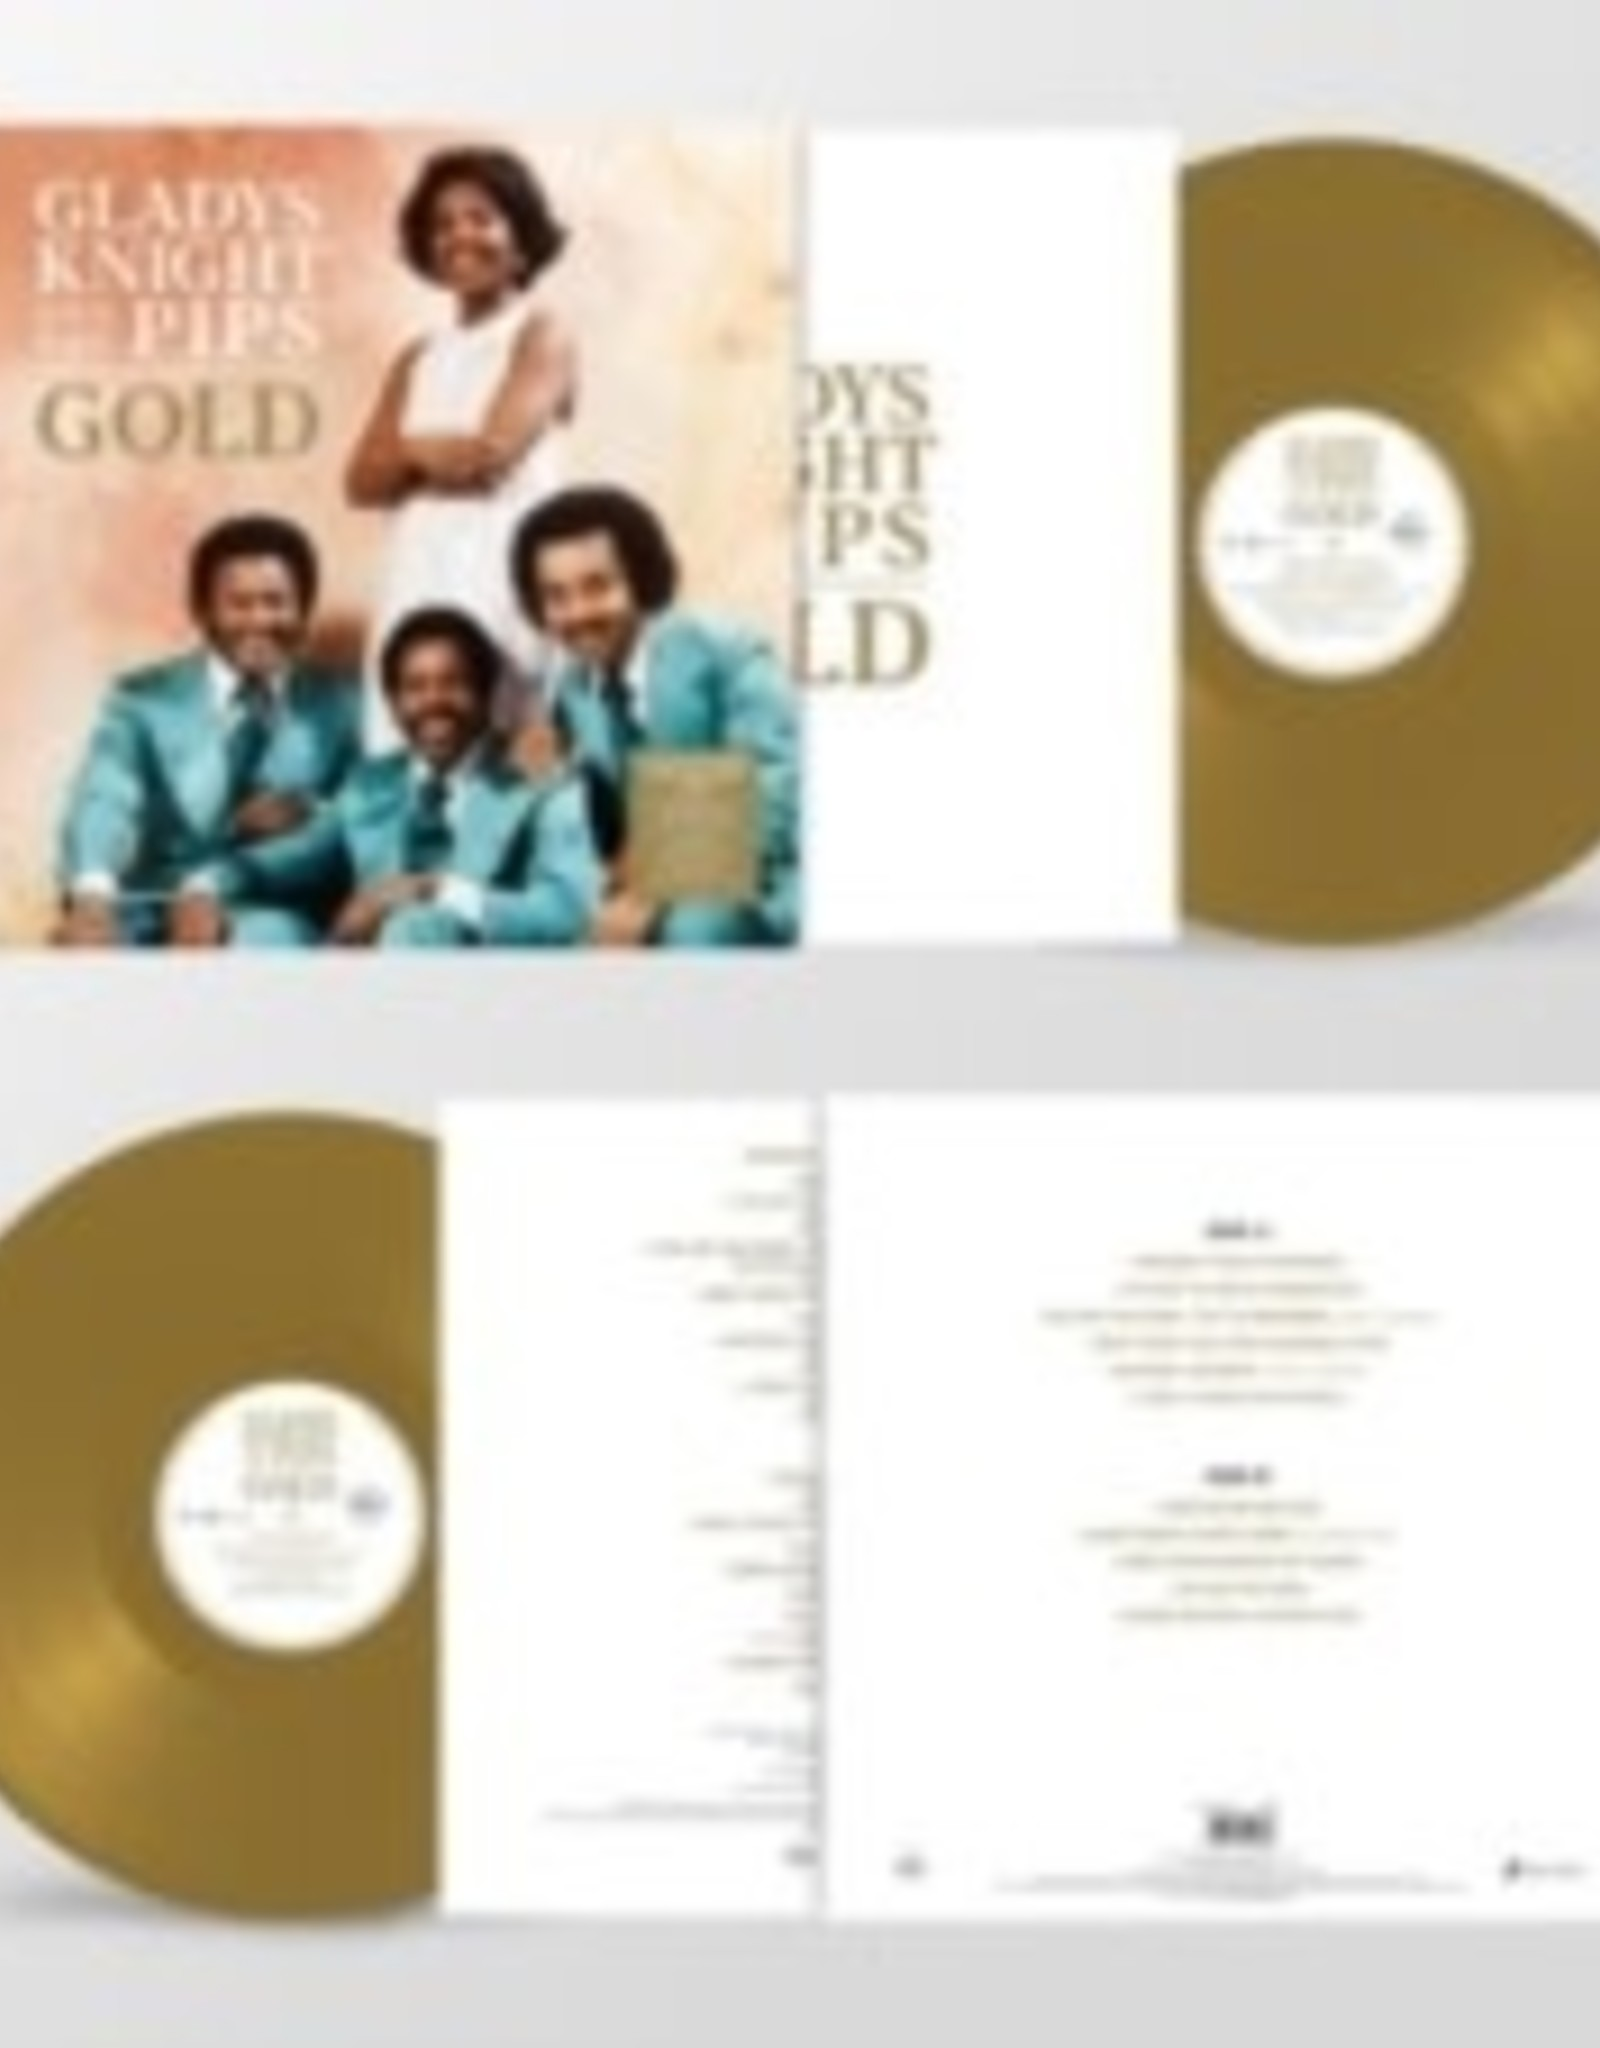 Gladys Knight & the Pips - Gold (Gold Vinyl)